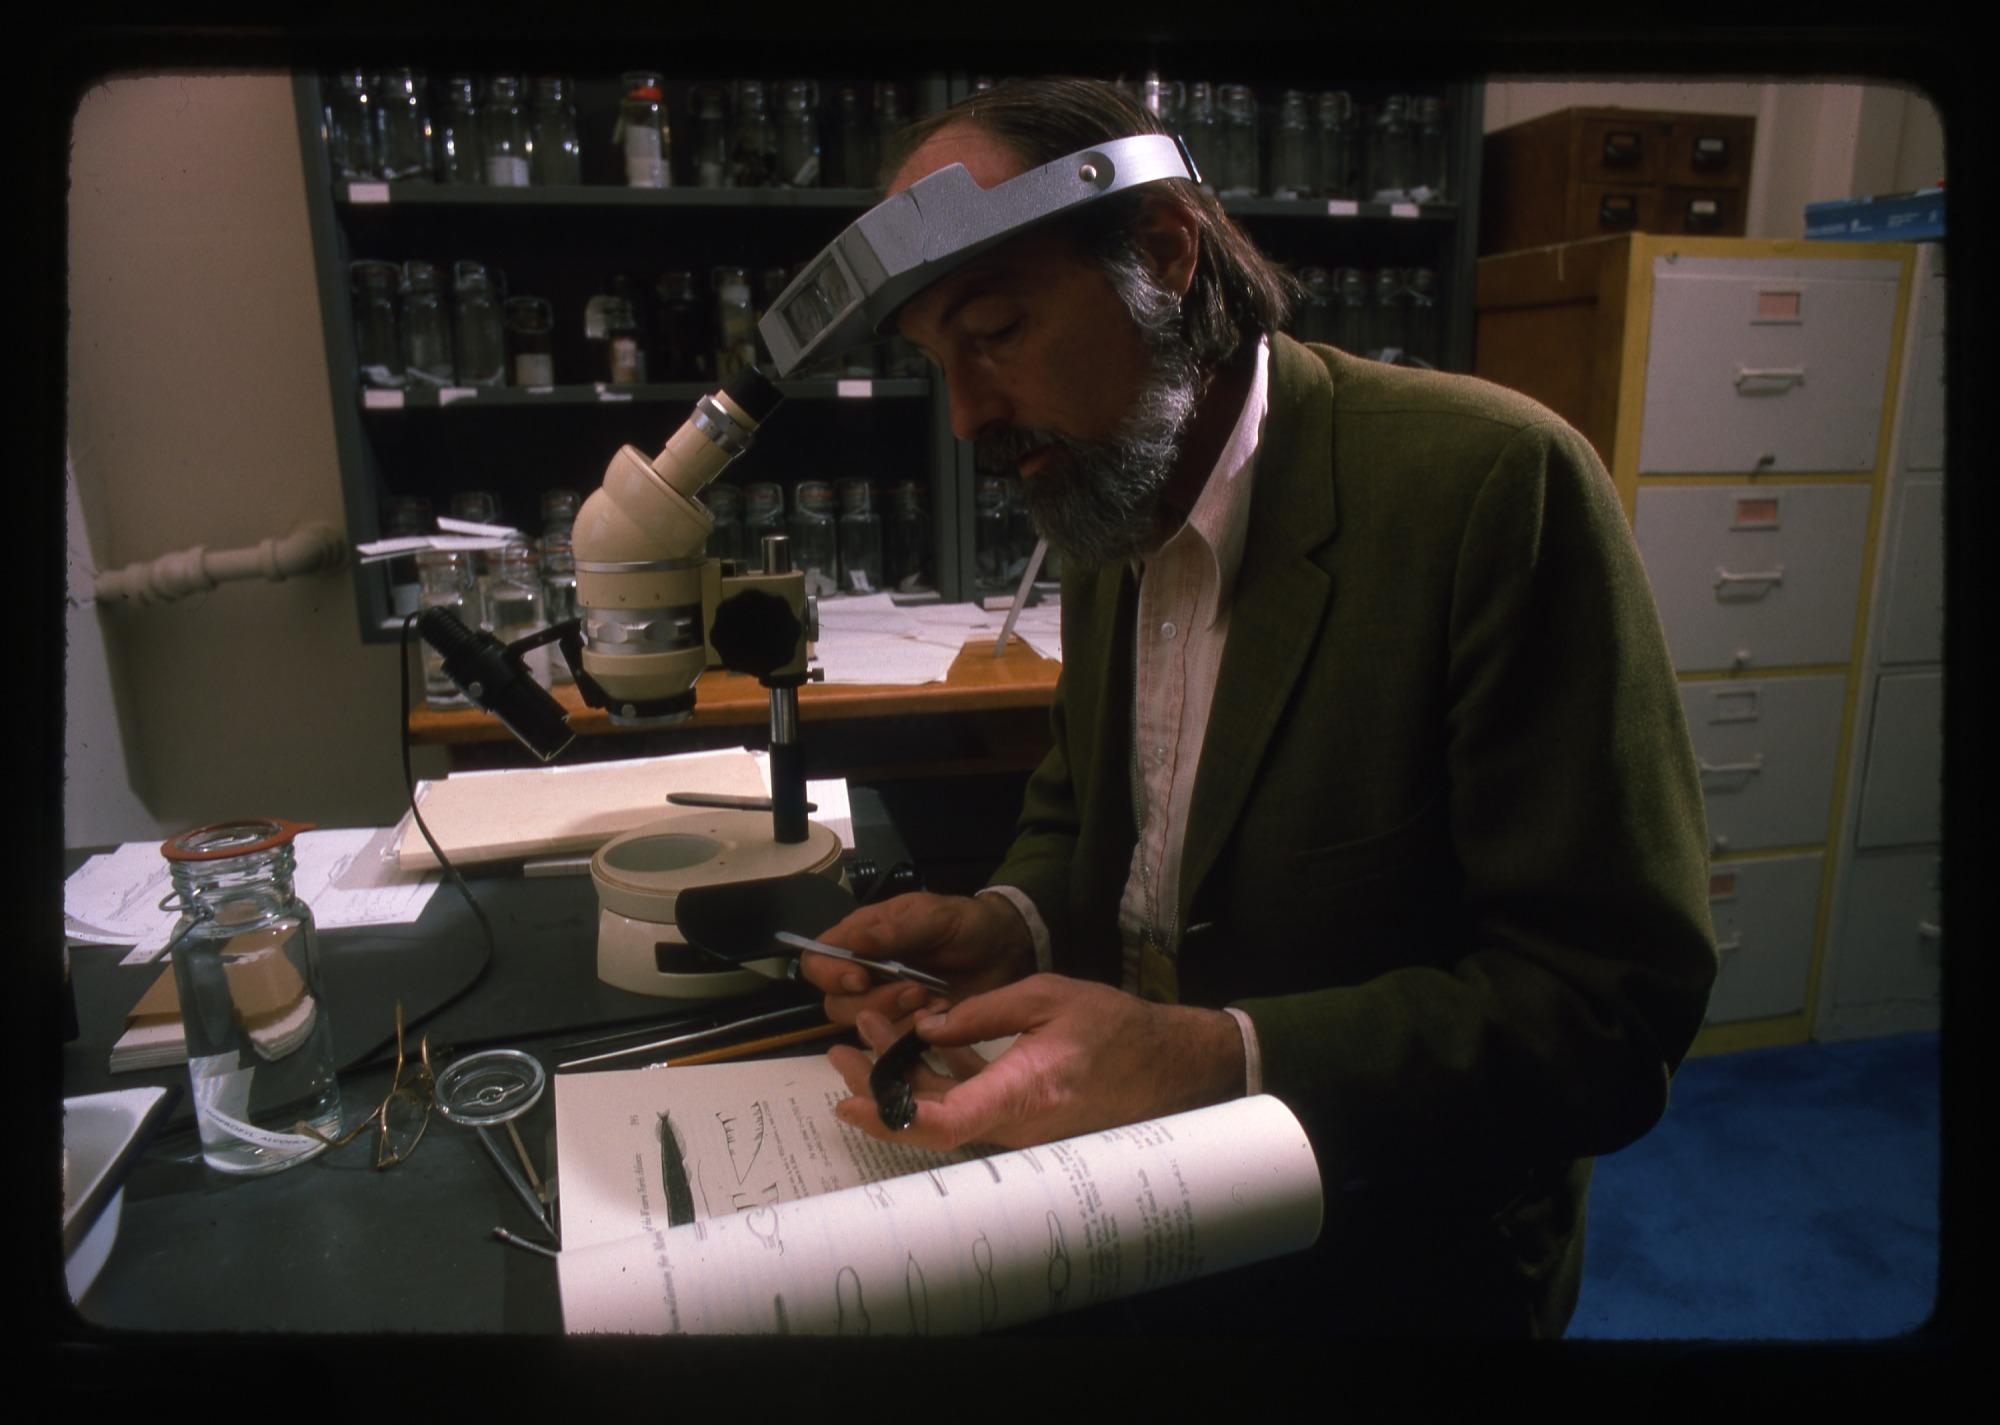 Robert H. Gibbs, Jr., Examining Fish